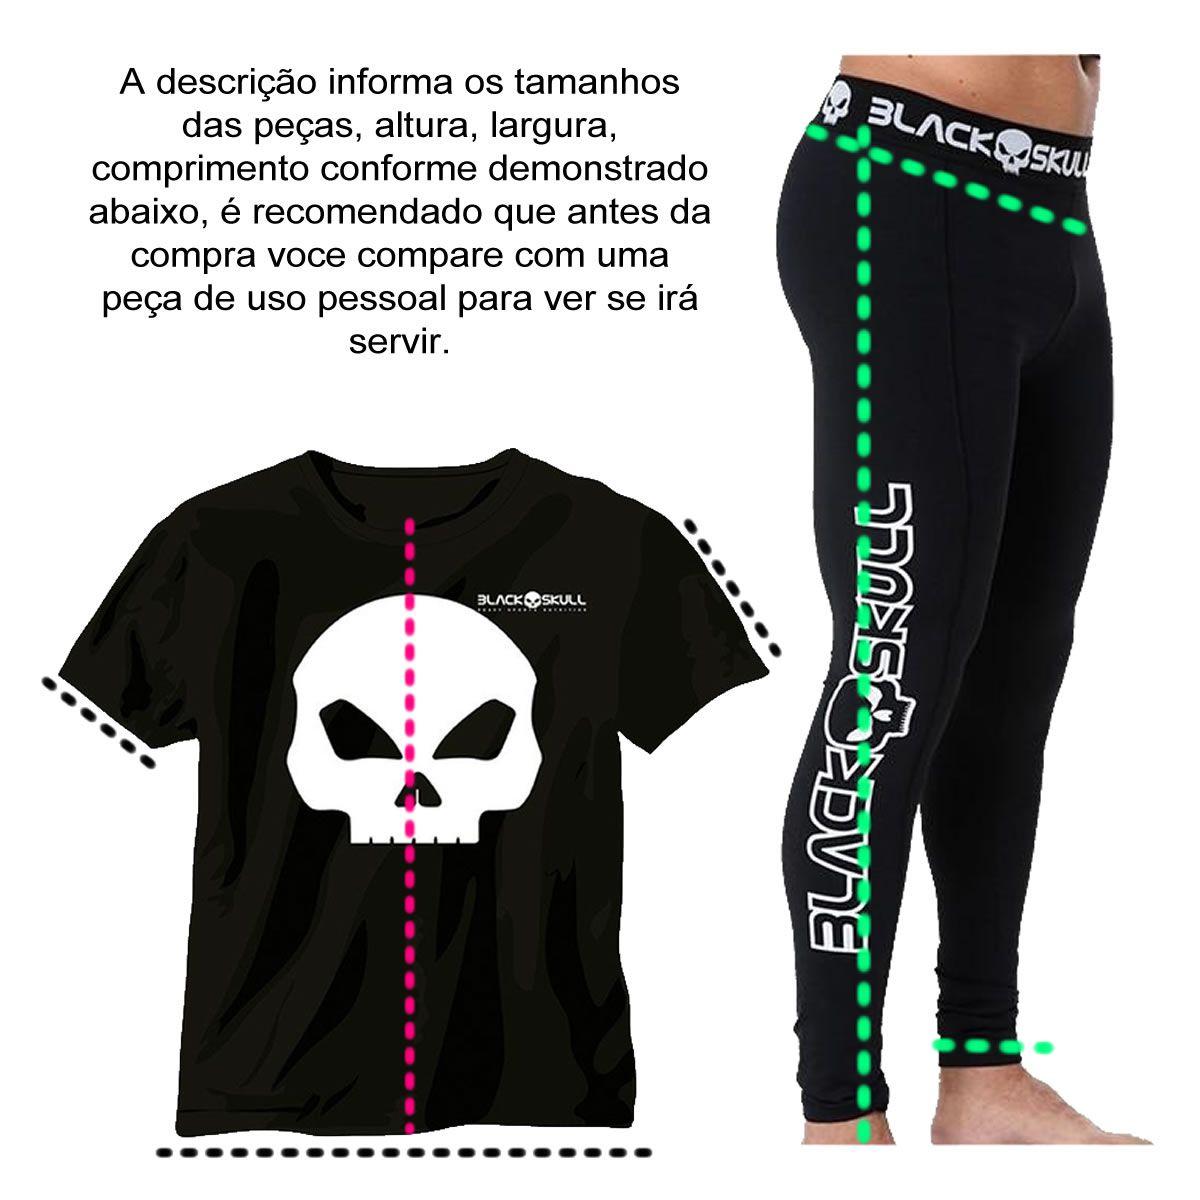 Top Grind Preto - Black Skull